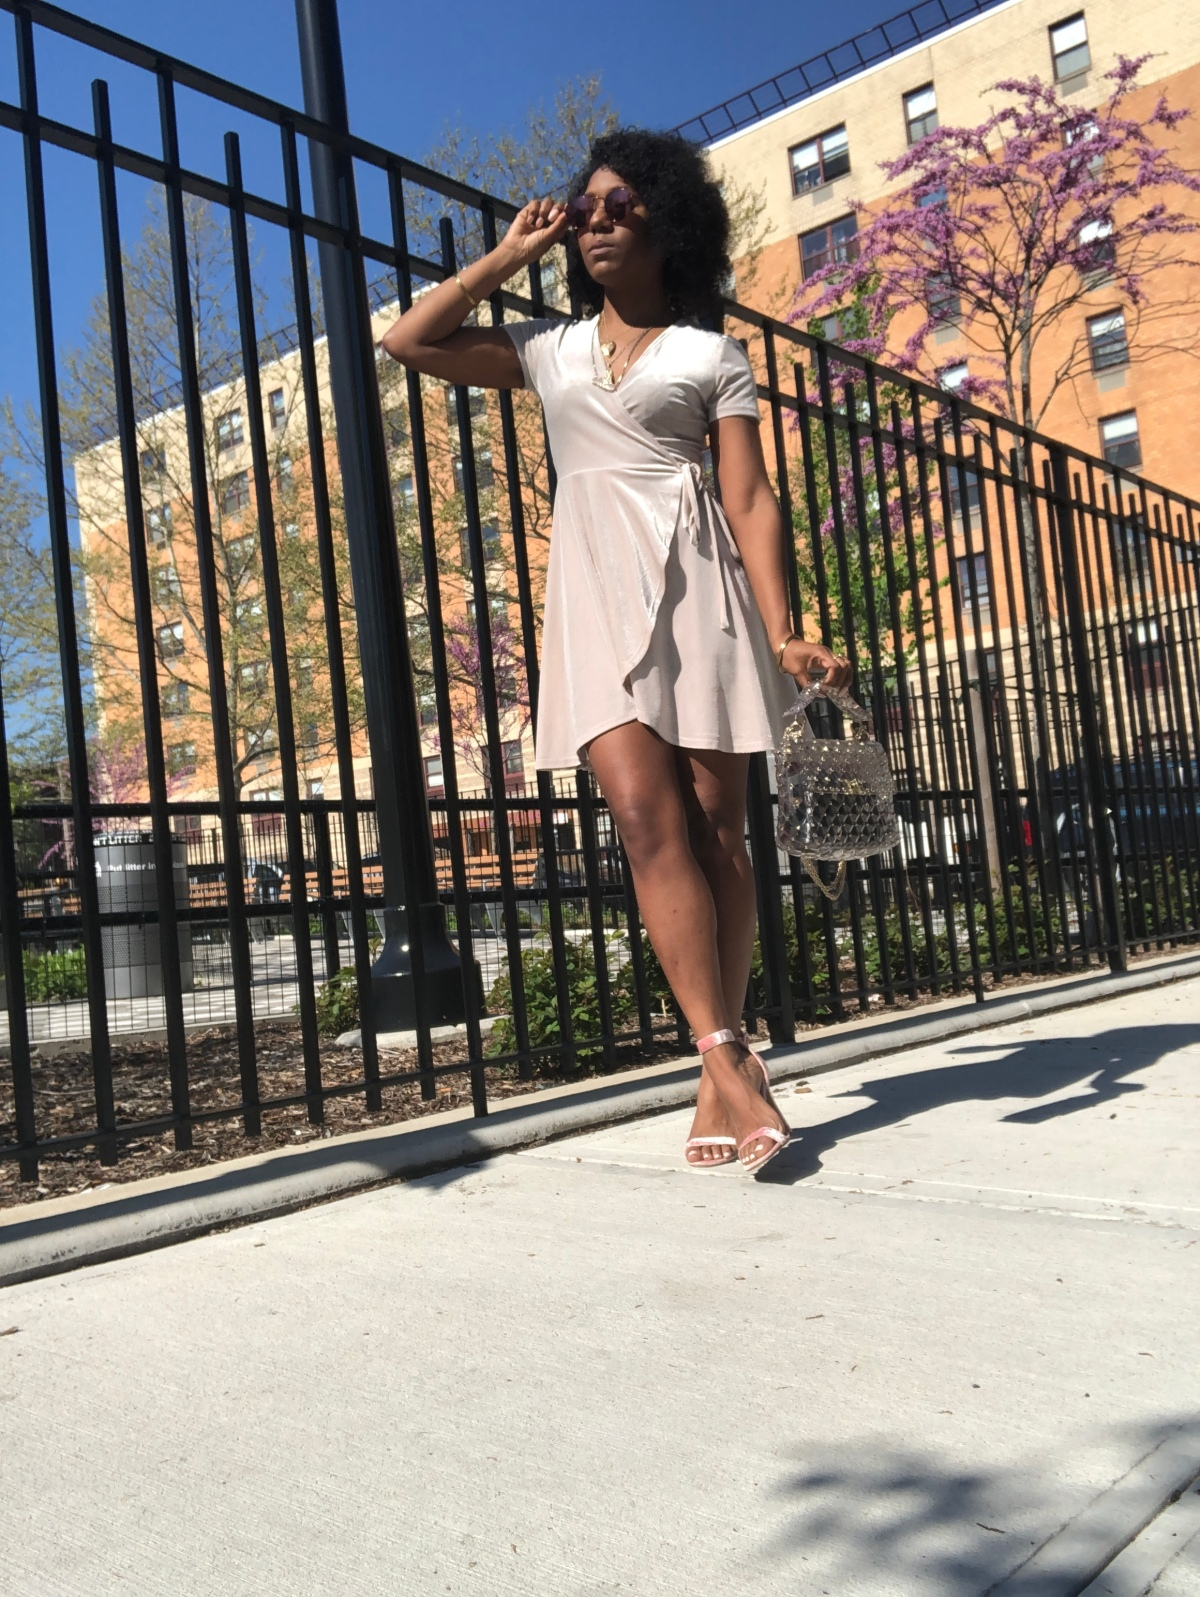 Wrap Dress - American Apparel   Heels - Forever 21   Top Handle Bag - Valentino   Mirrored Sunglasses - H&M